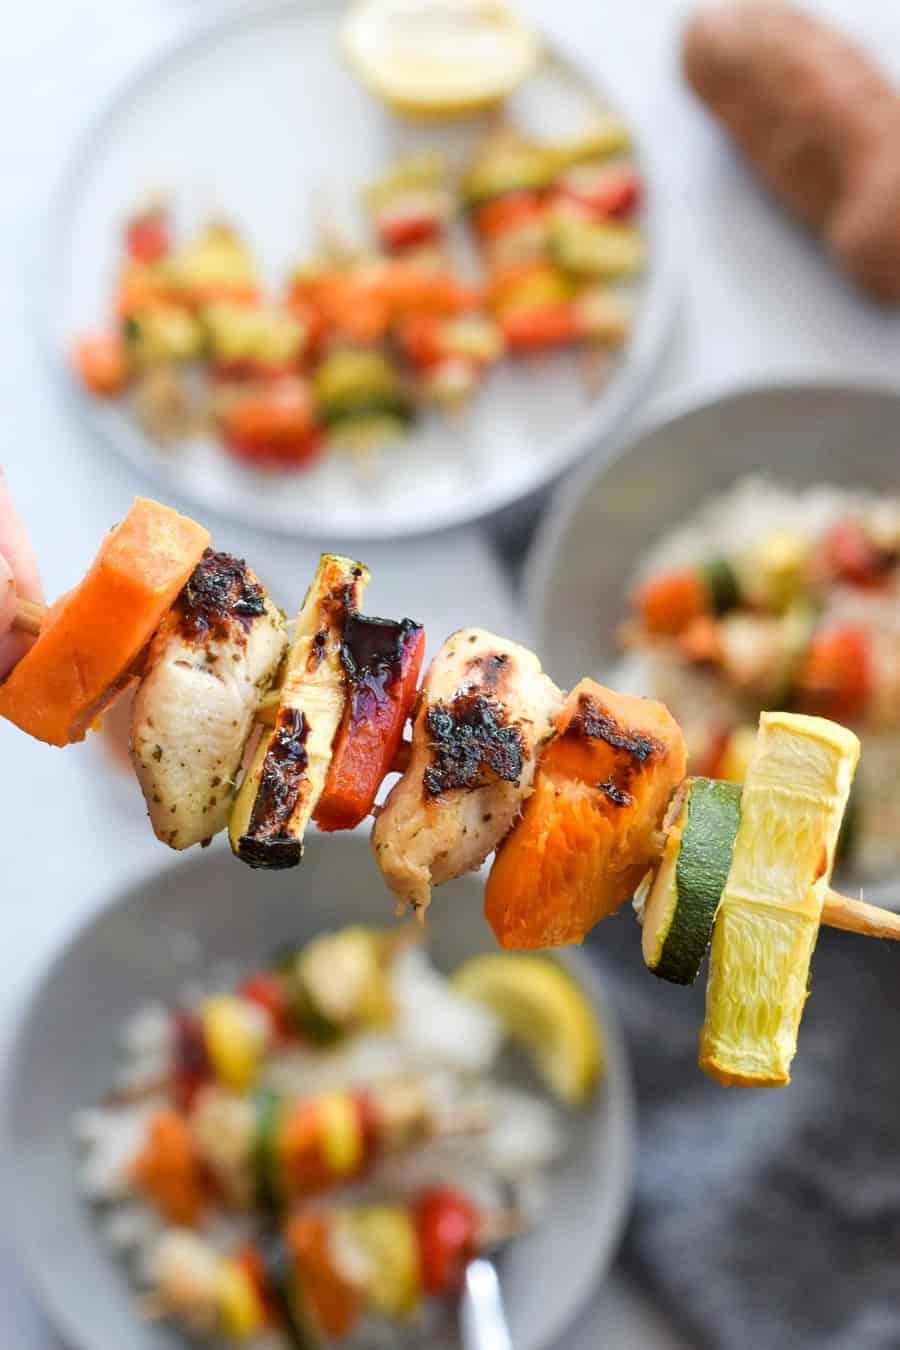 kabob skewer with chicken, sweet potatoes and veggies